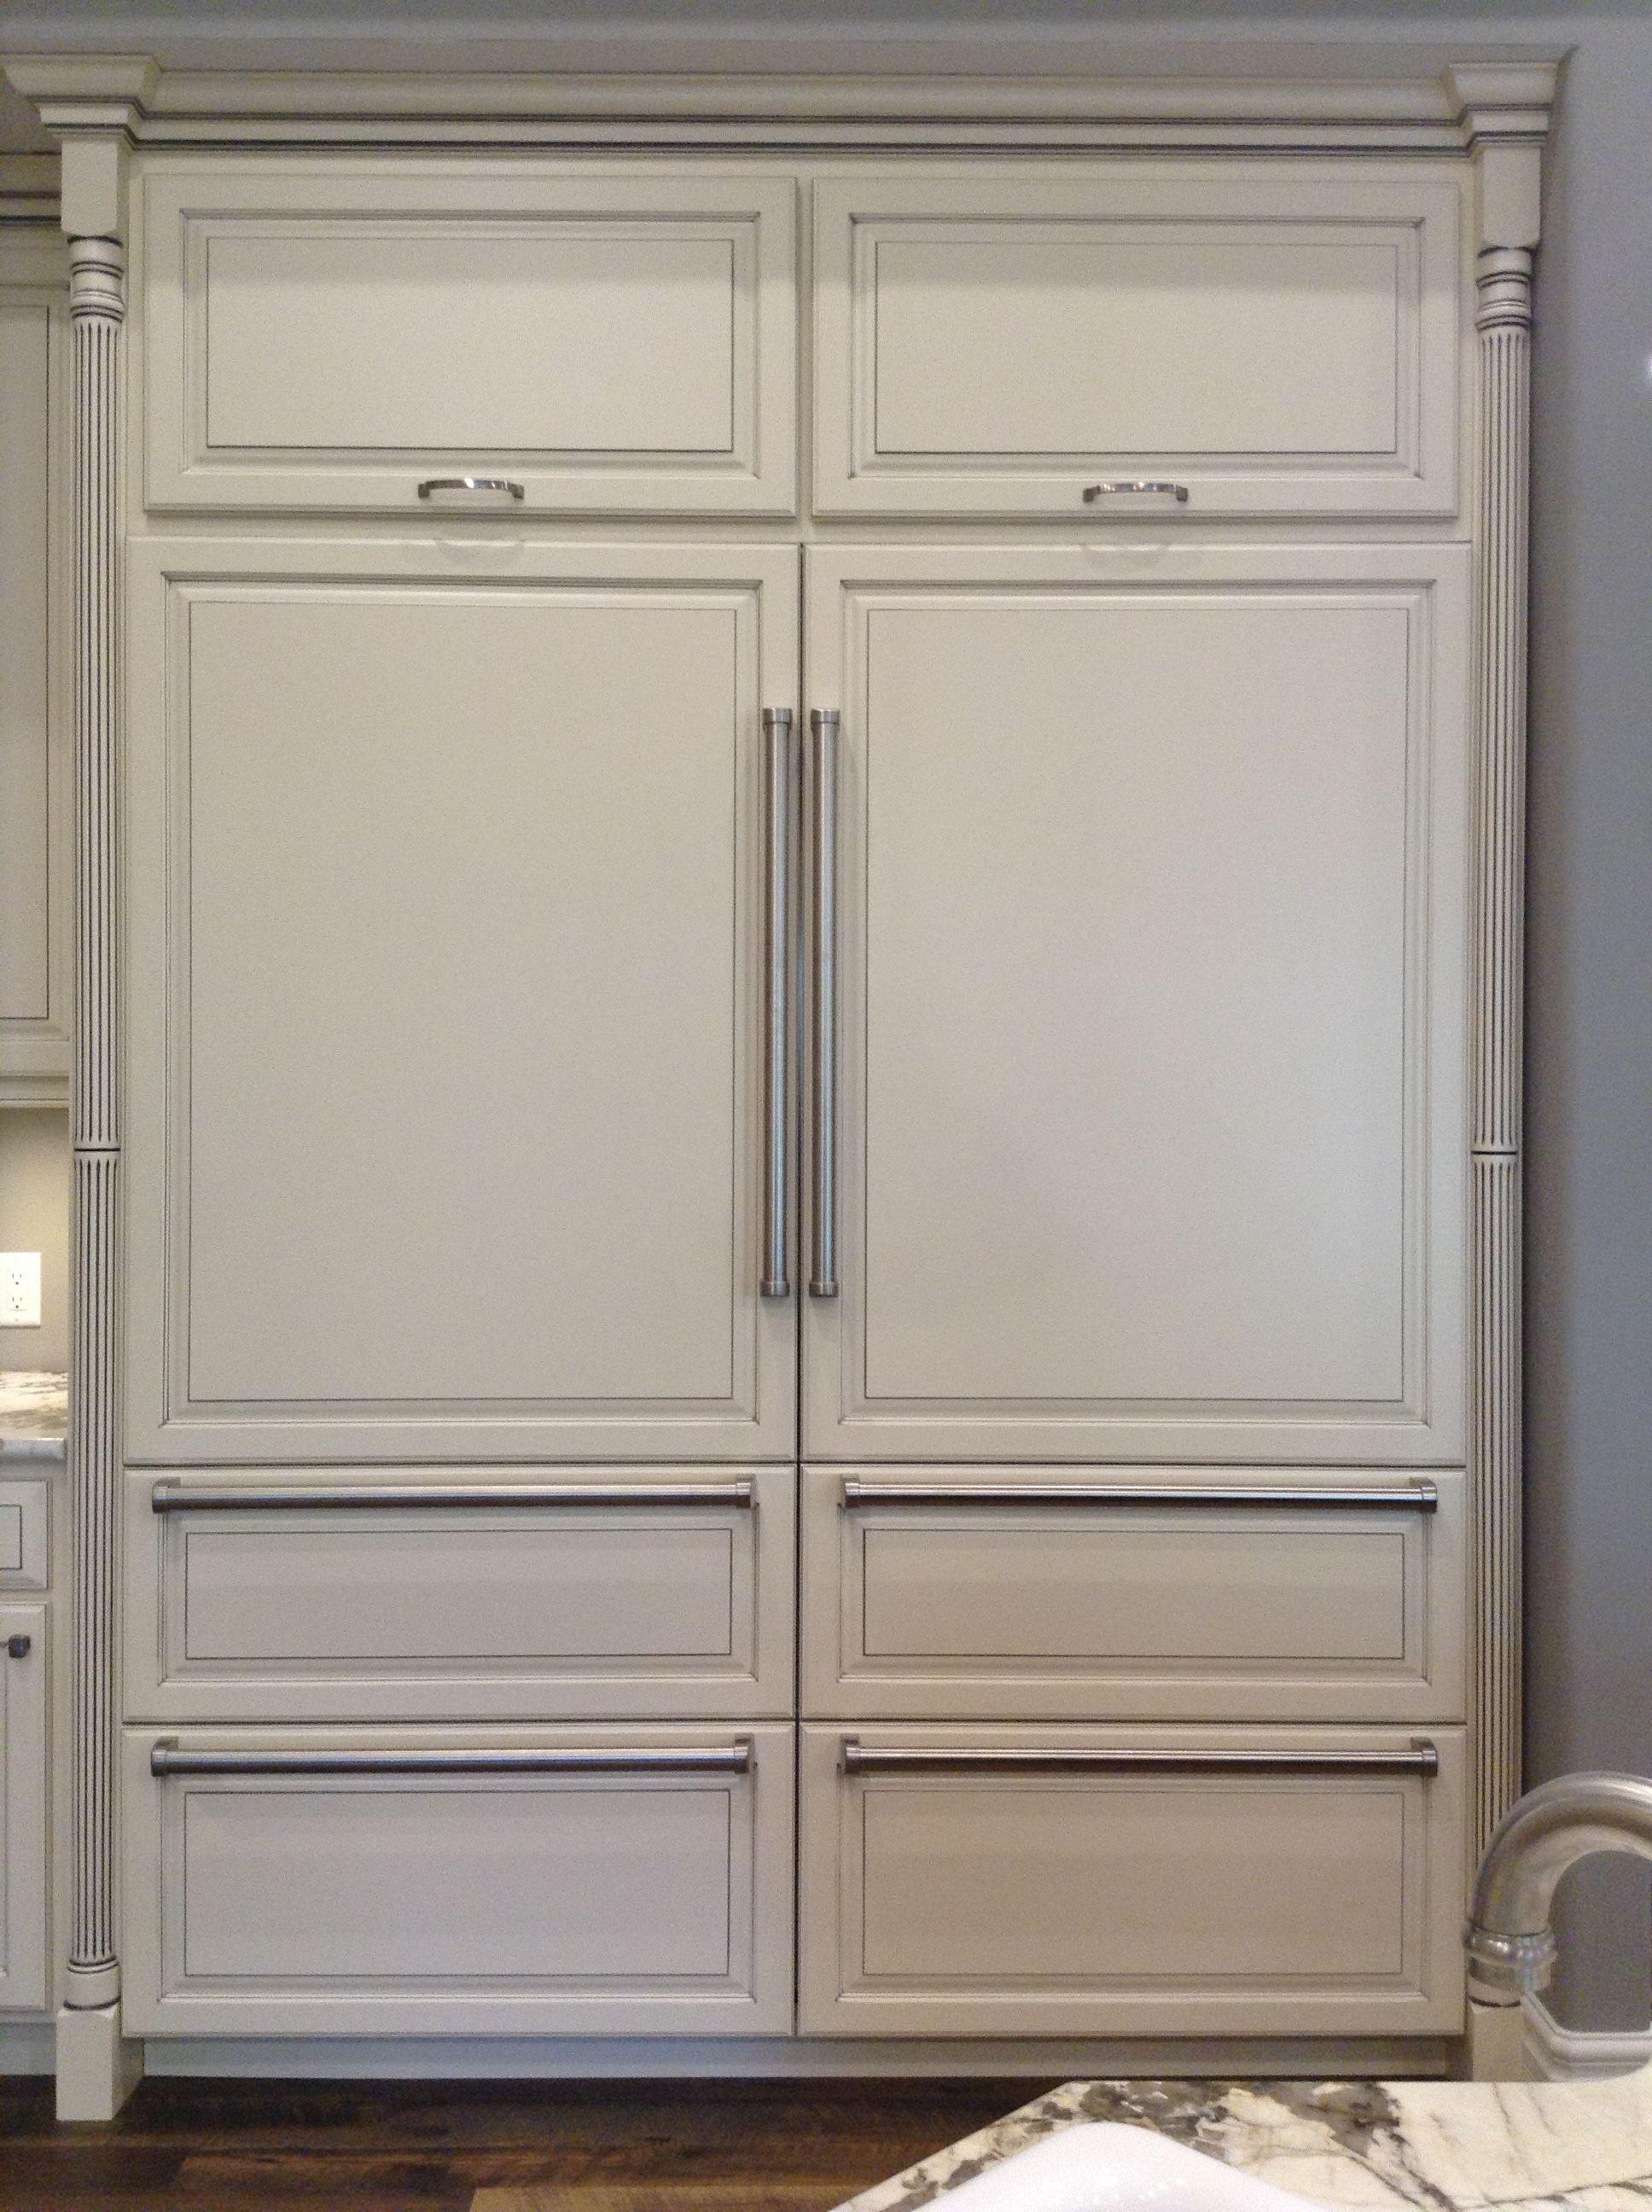 Refrigerator That Looks Like Cabinet